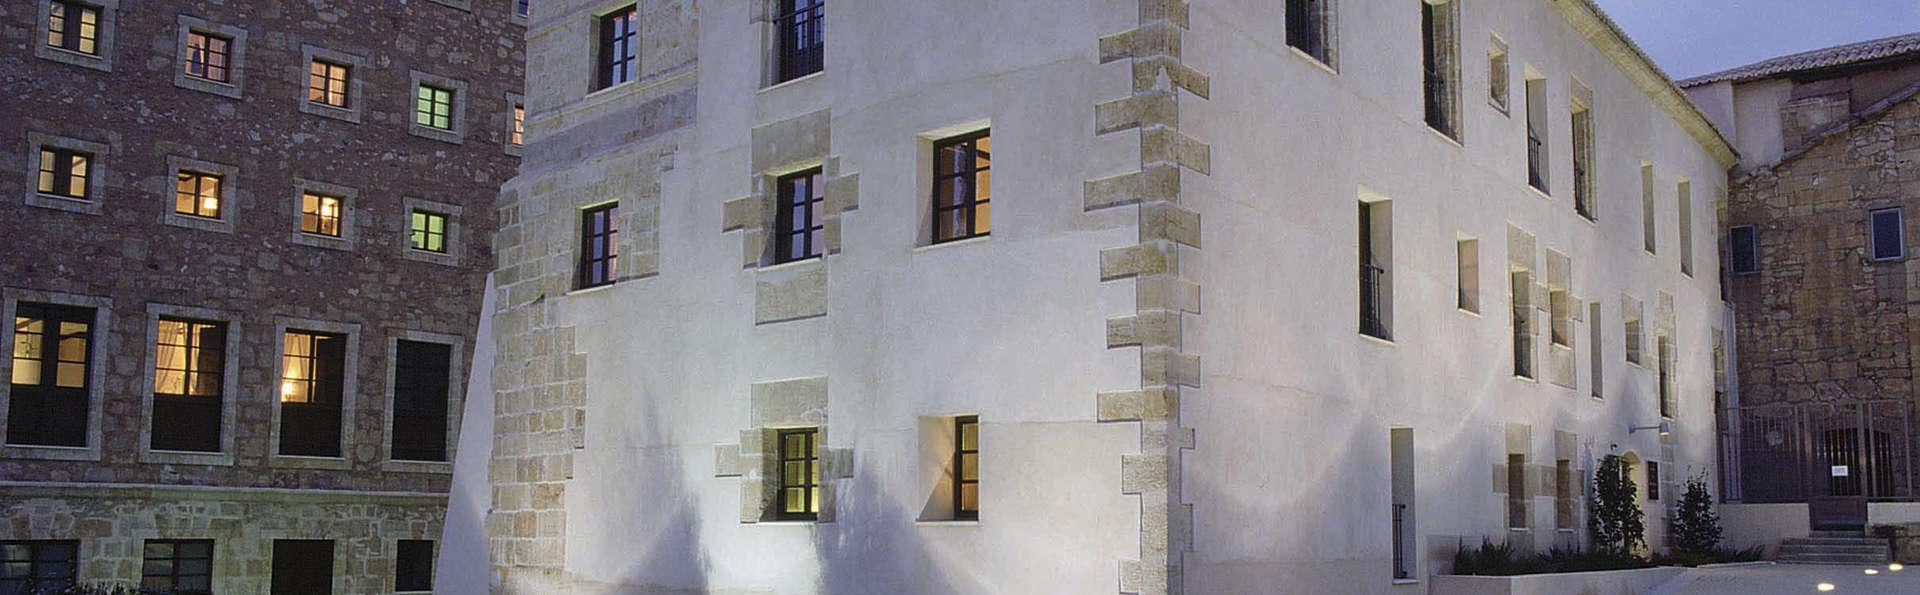 Hospes Palacio de San Esteban - EDIT_principal.jpg